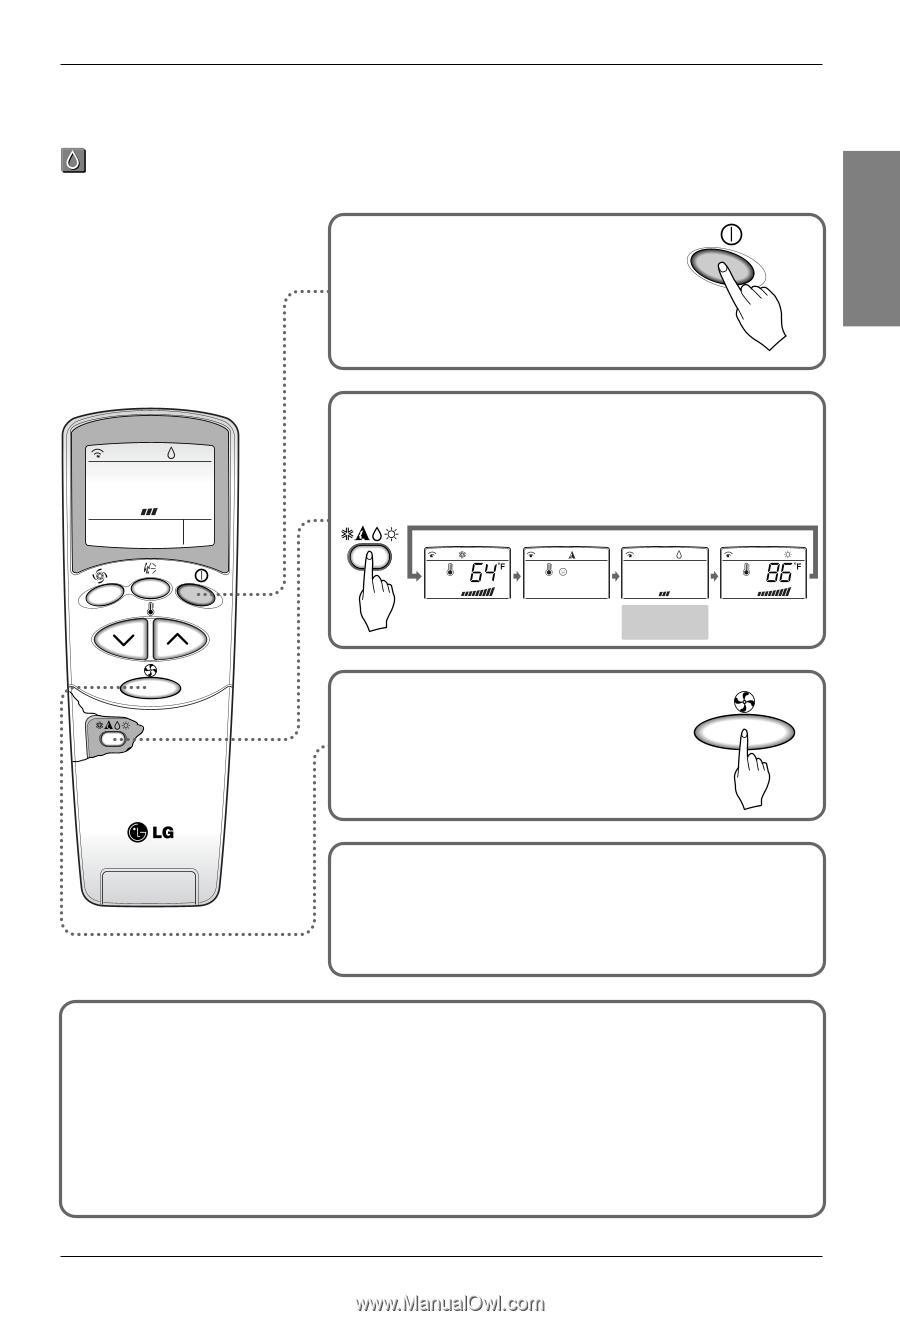 lg lan091hnp owner s manual page 12 rh manualowl com lg neo plasma air conditioner remote control lg neo plasma remote control code